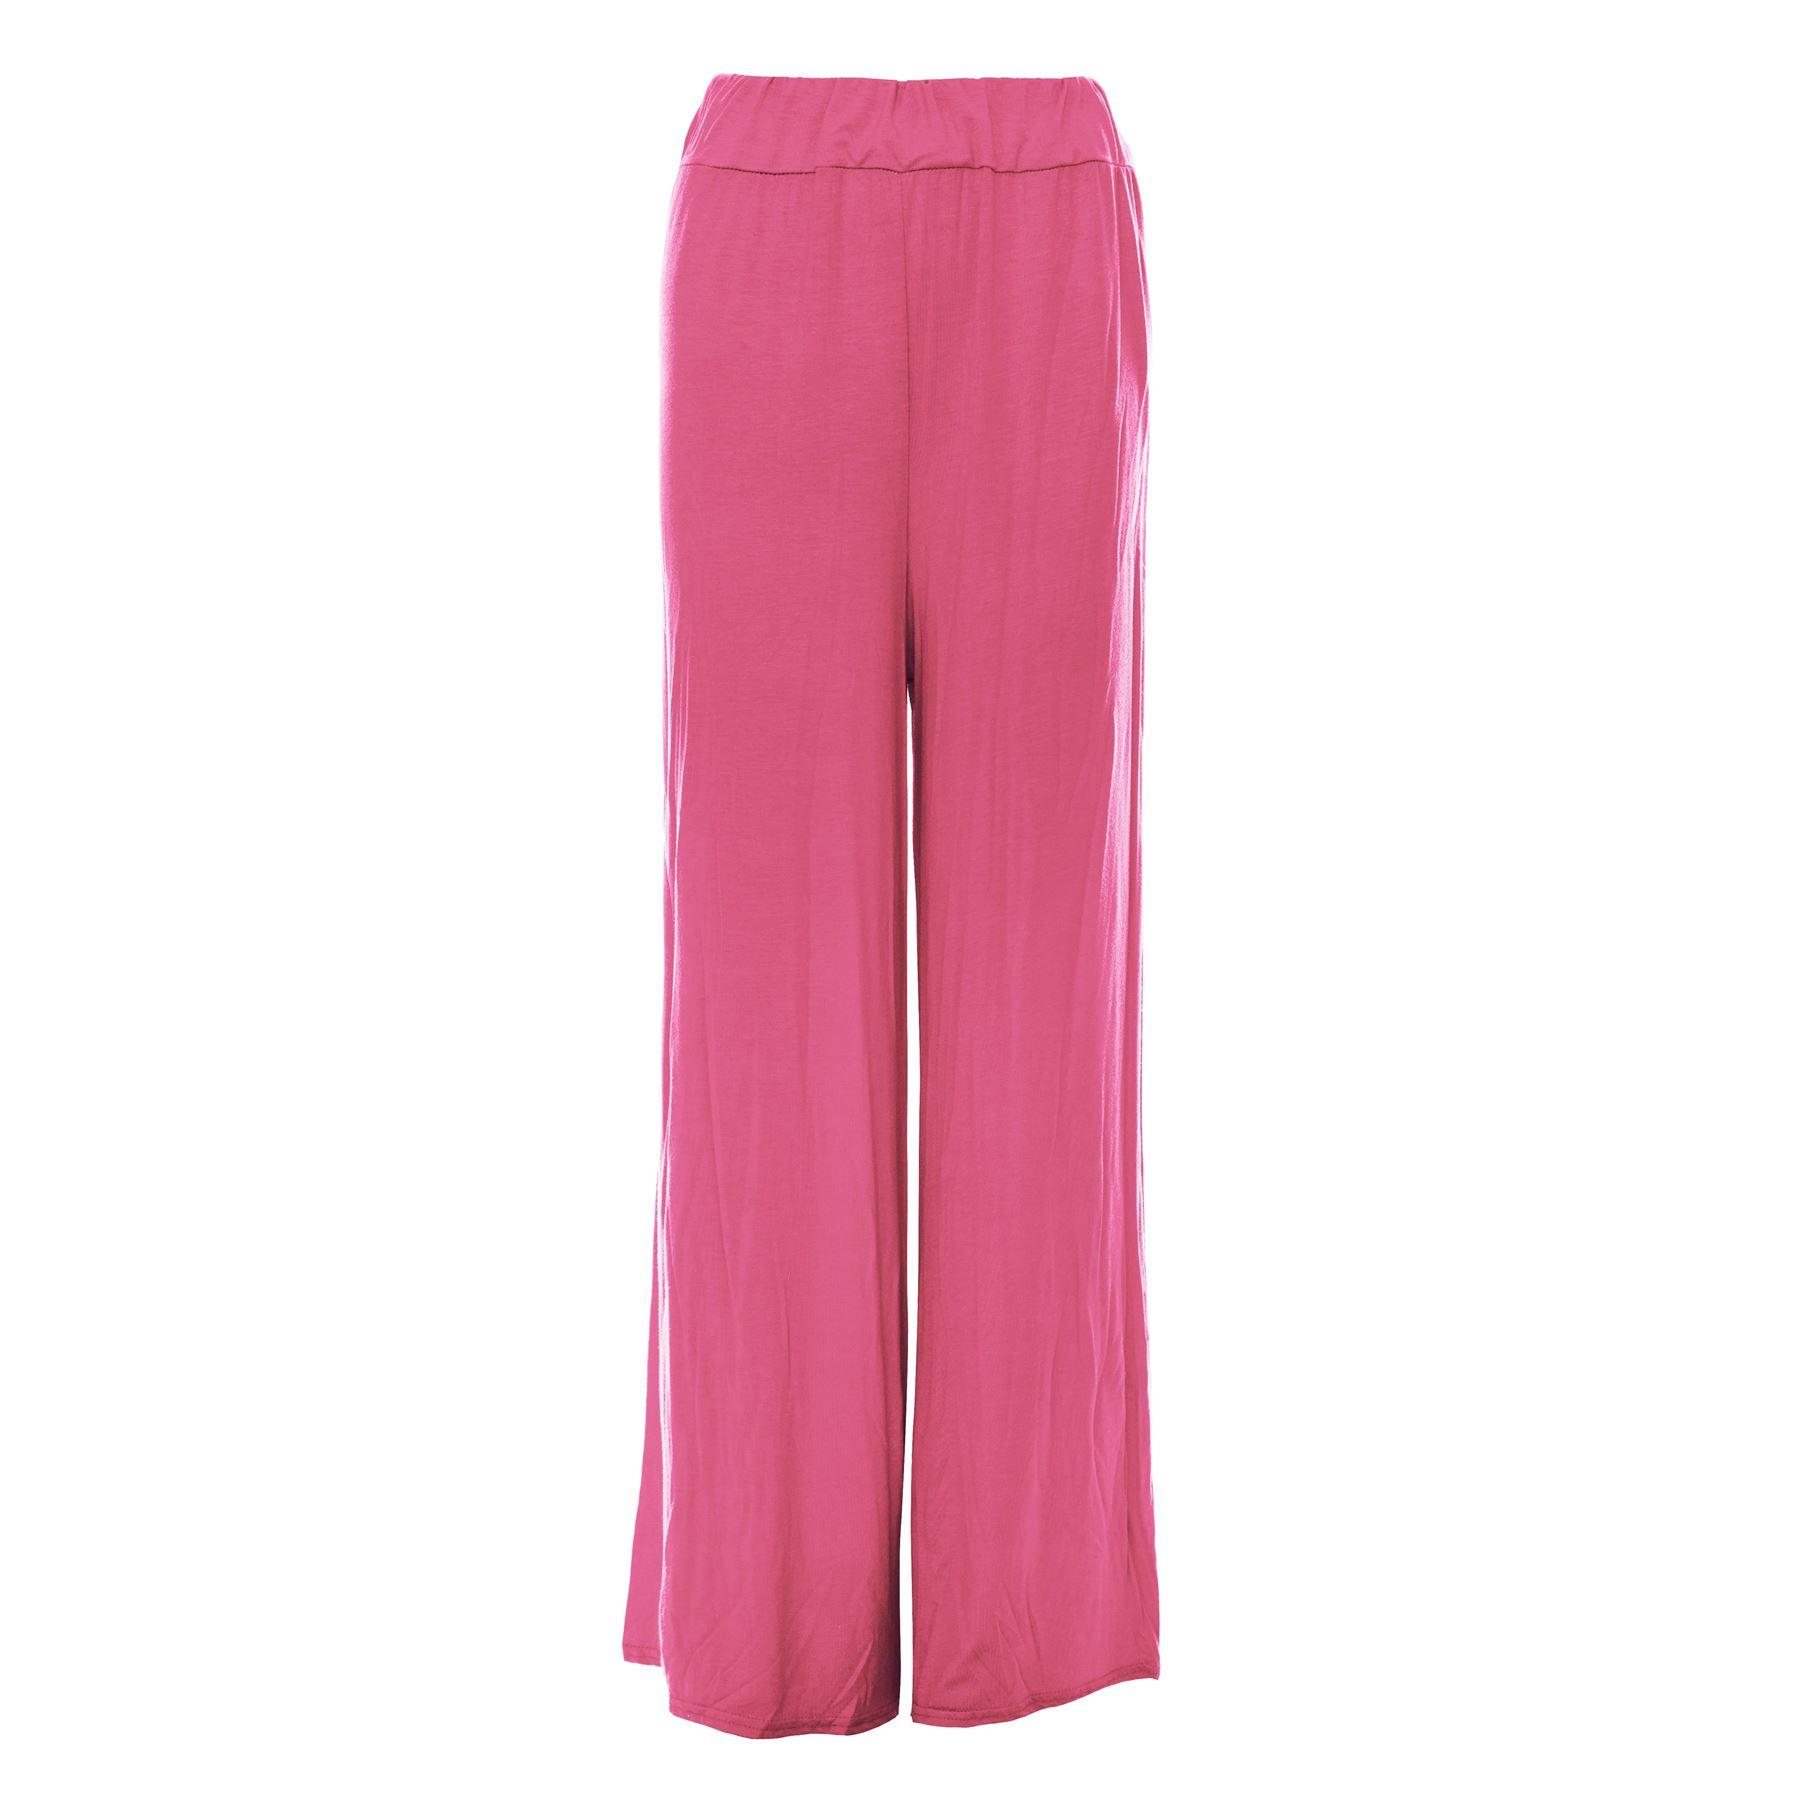 Palazzo pants for plus size women